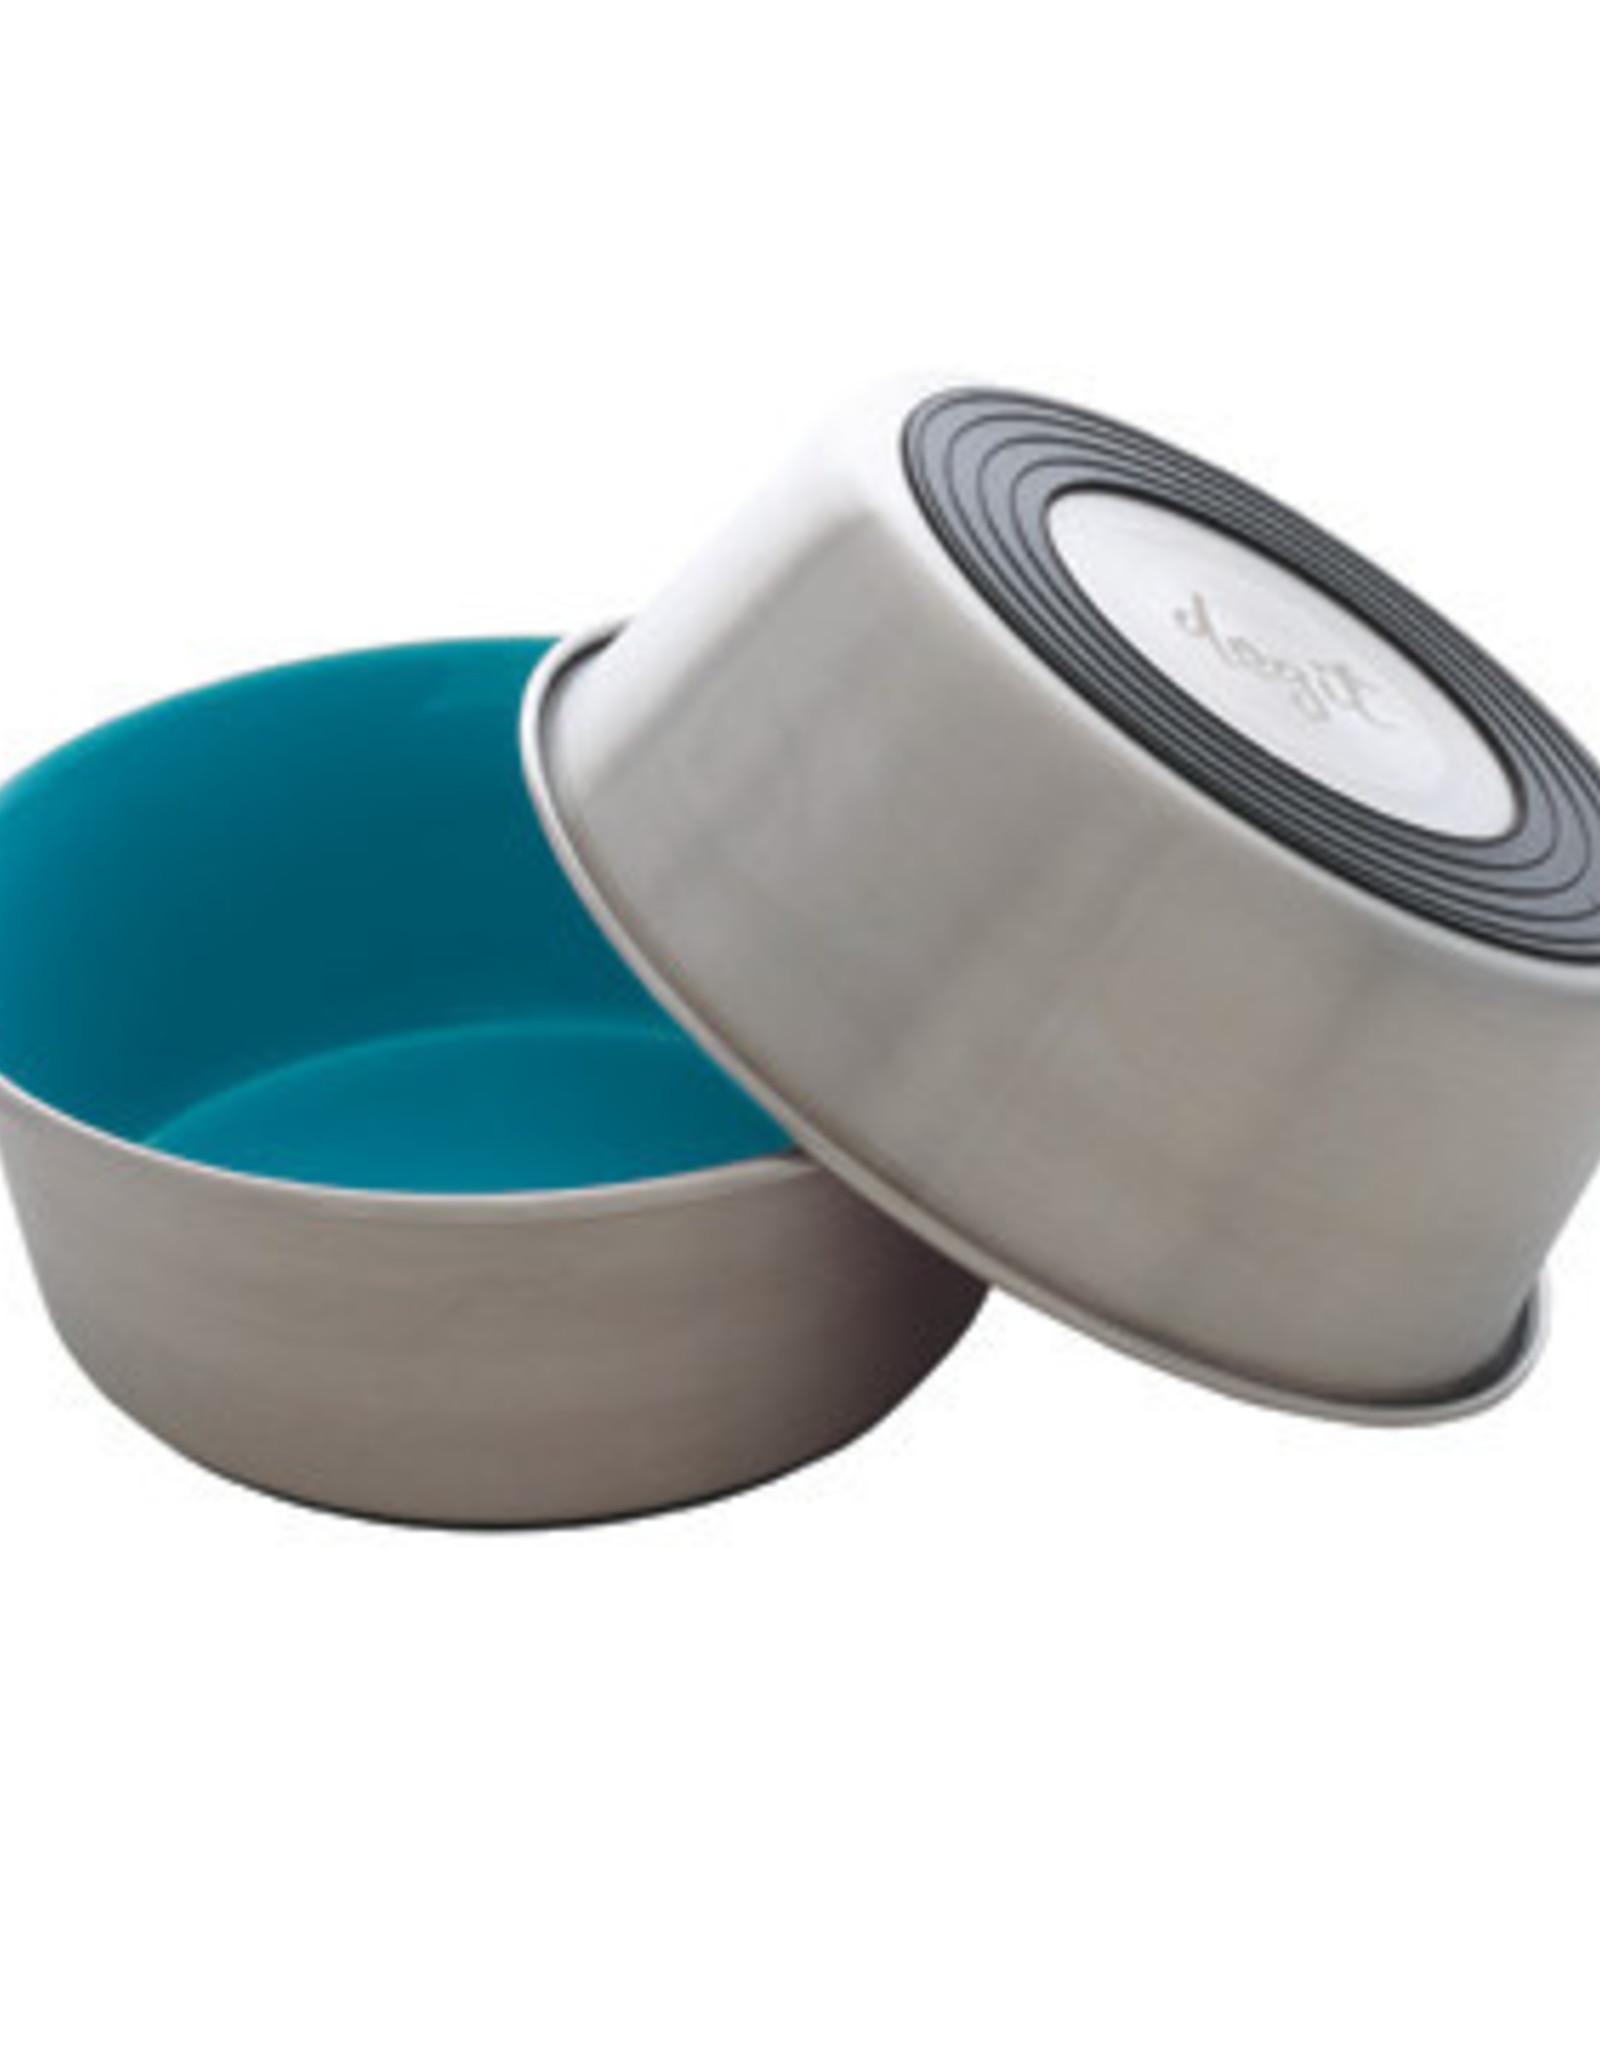 DogIt Dogit Stainless Steel Non-Skid Dog Bowl - Blue - 1.15 L (39 fl.oz.)